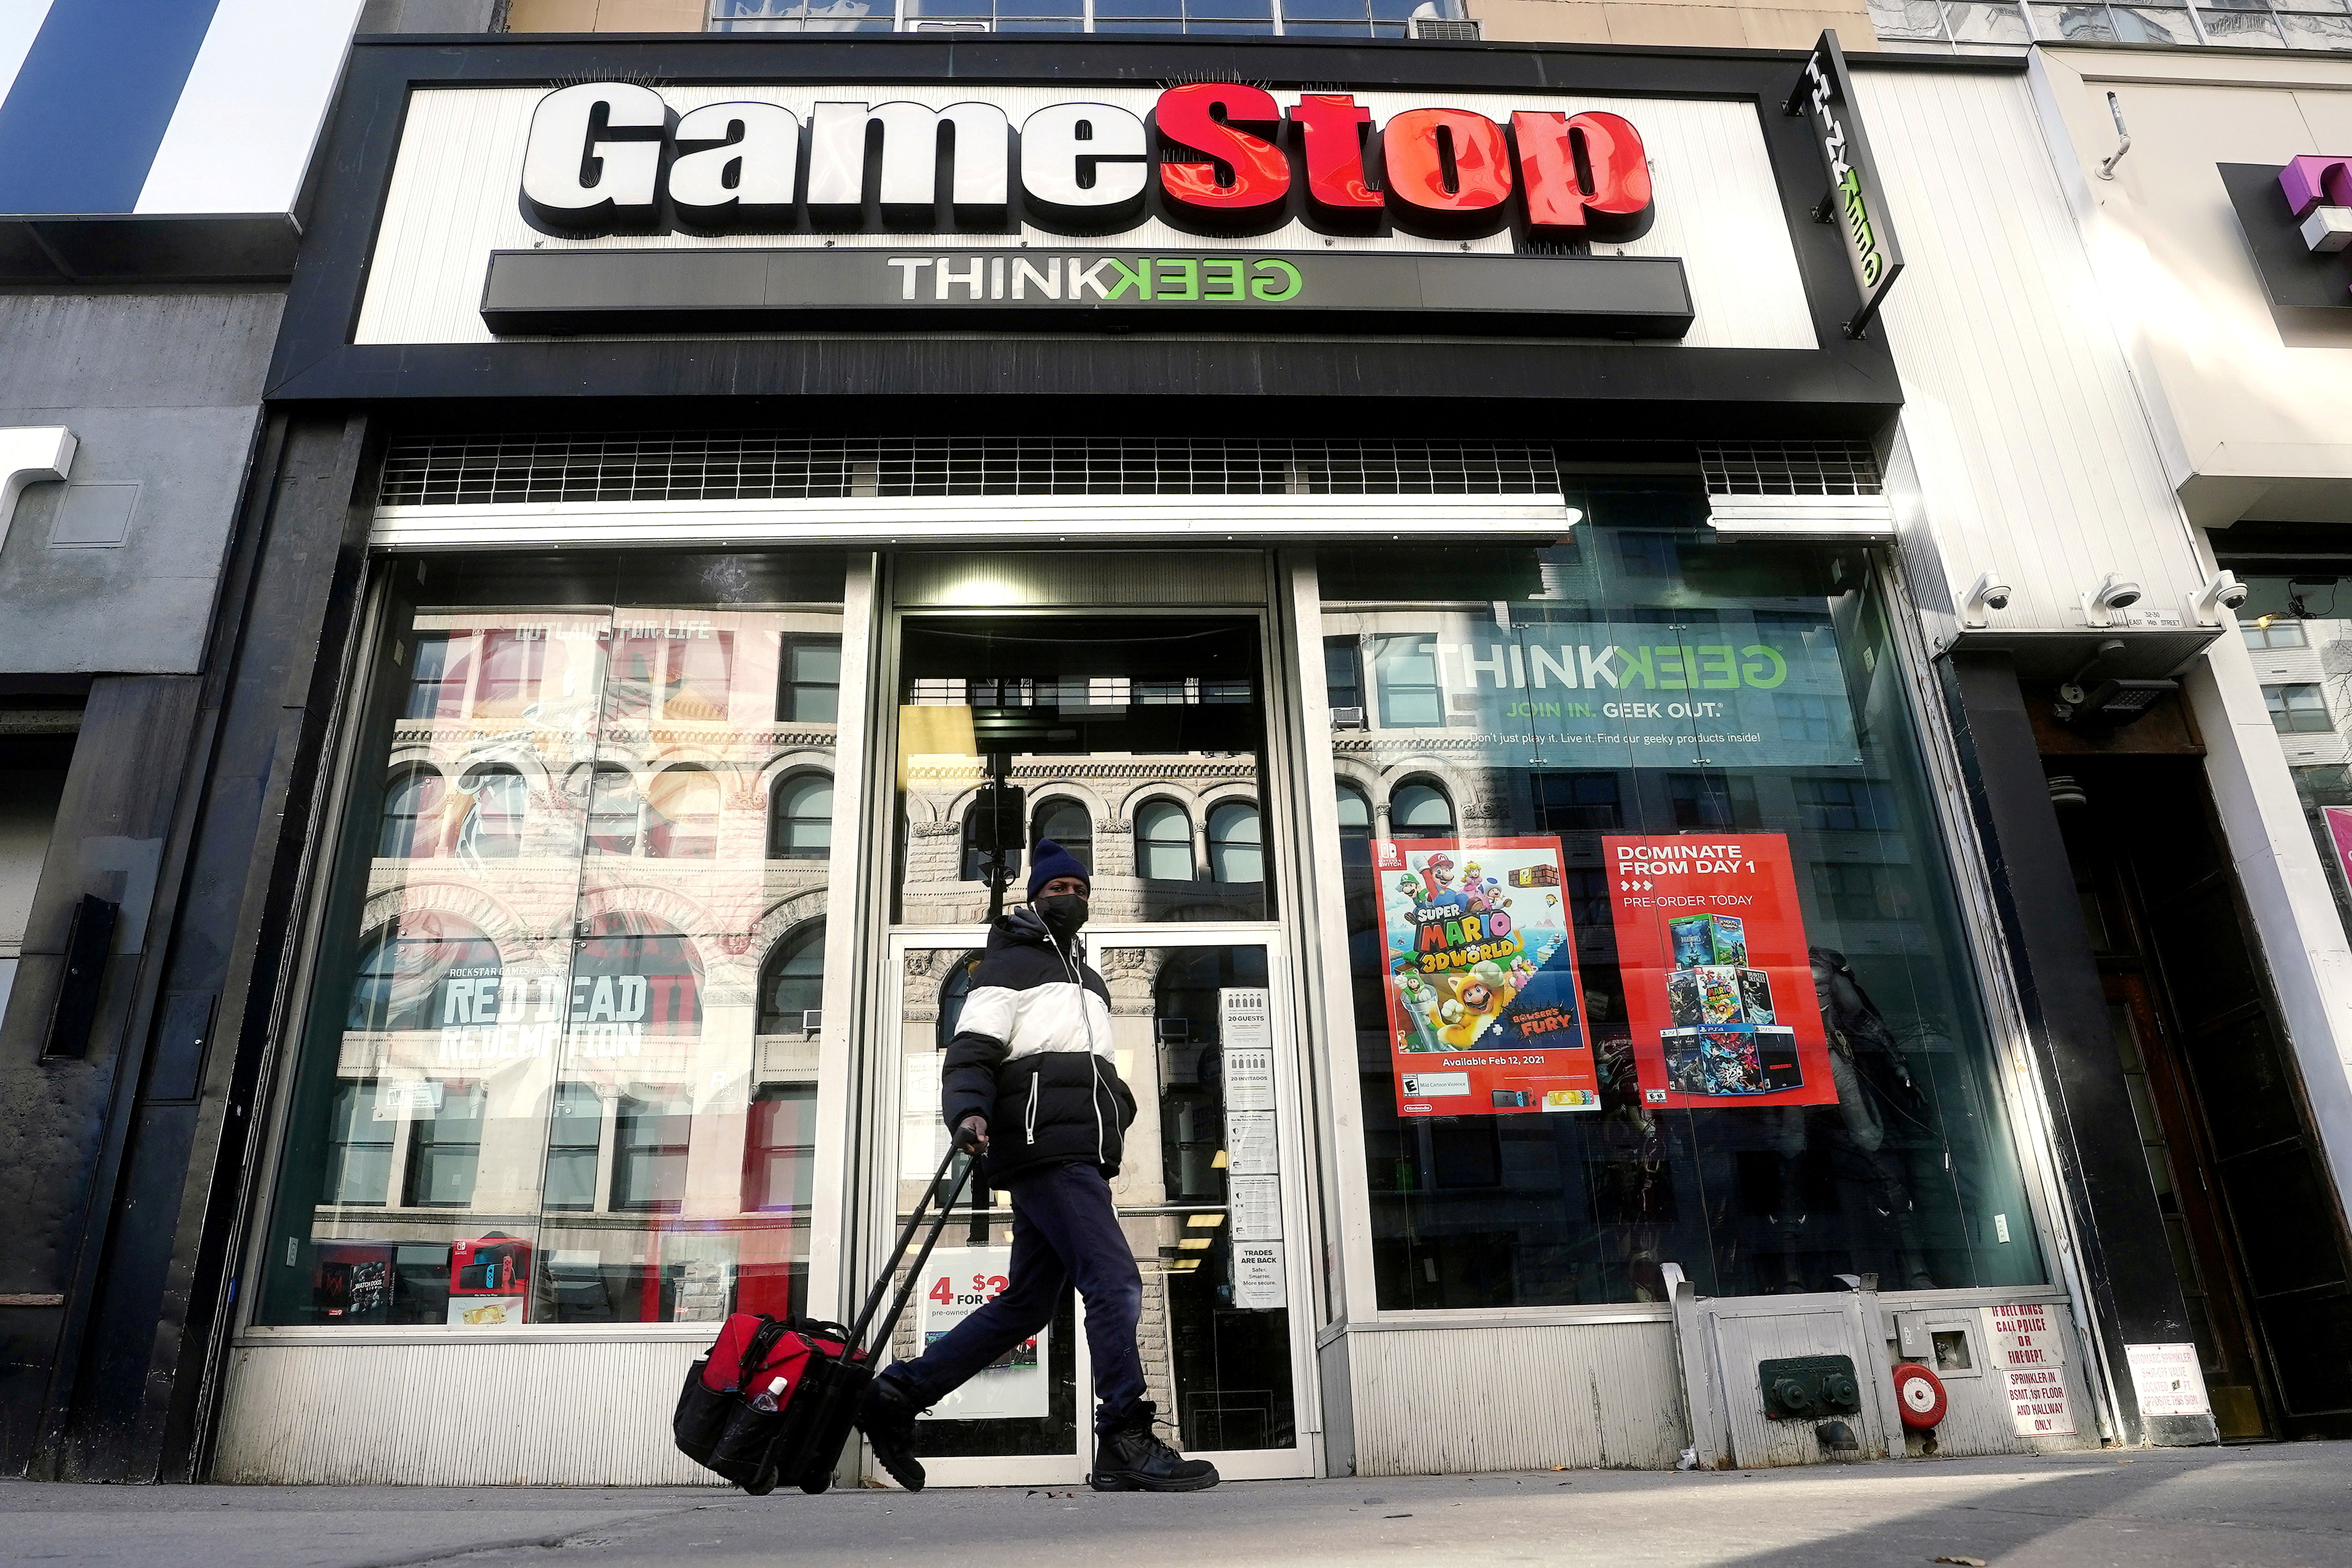 A person walks past a GameStop store in the Manhattan borough of New York City, New York, U.S., January 29, 2021. REUTERS/Carlo Allegri